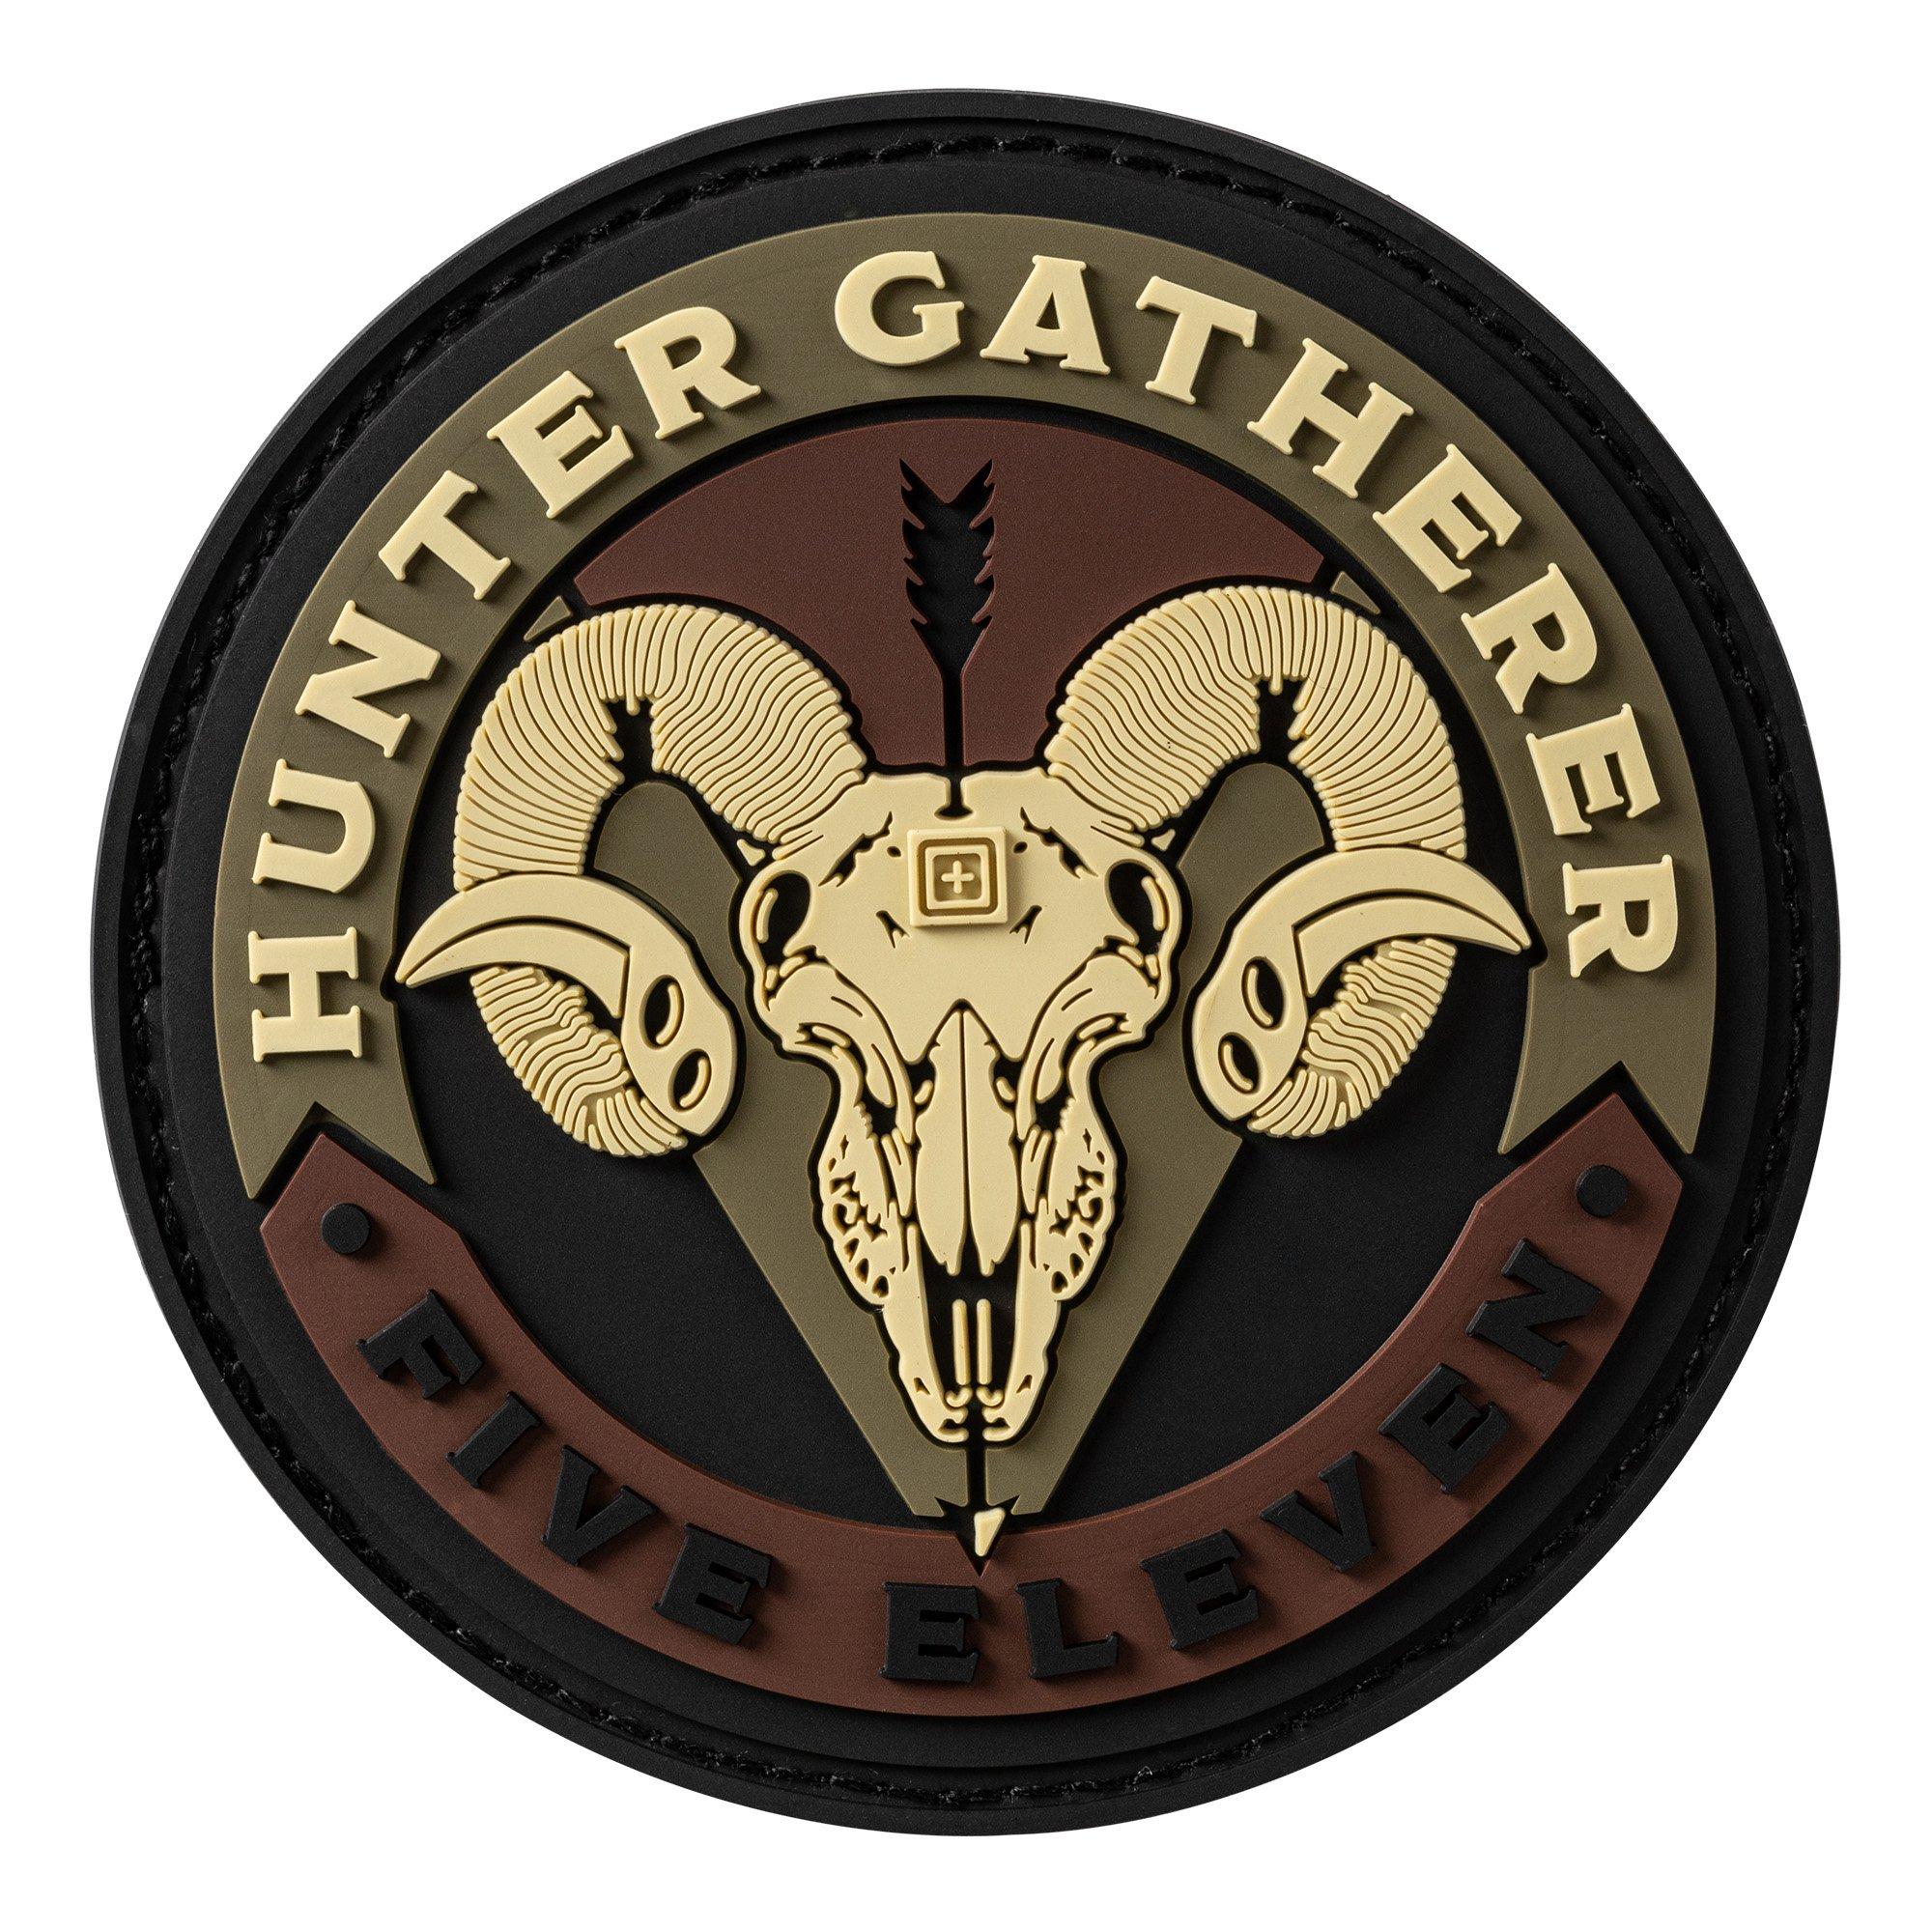 HUNTER GATHERER PATCH 225 : MILITARY GRN